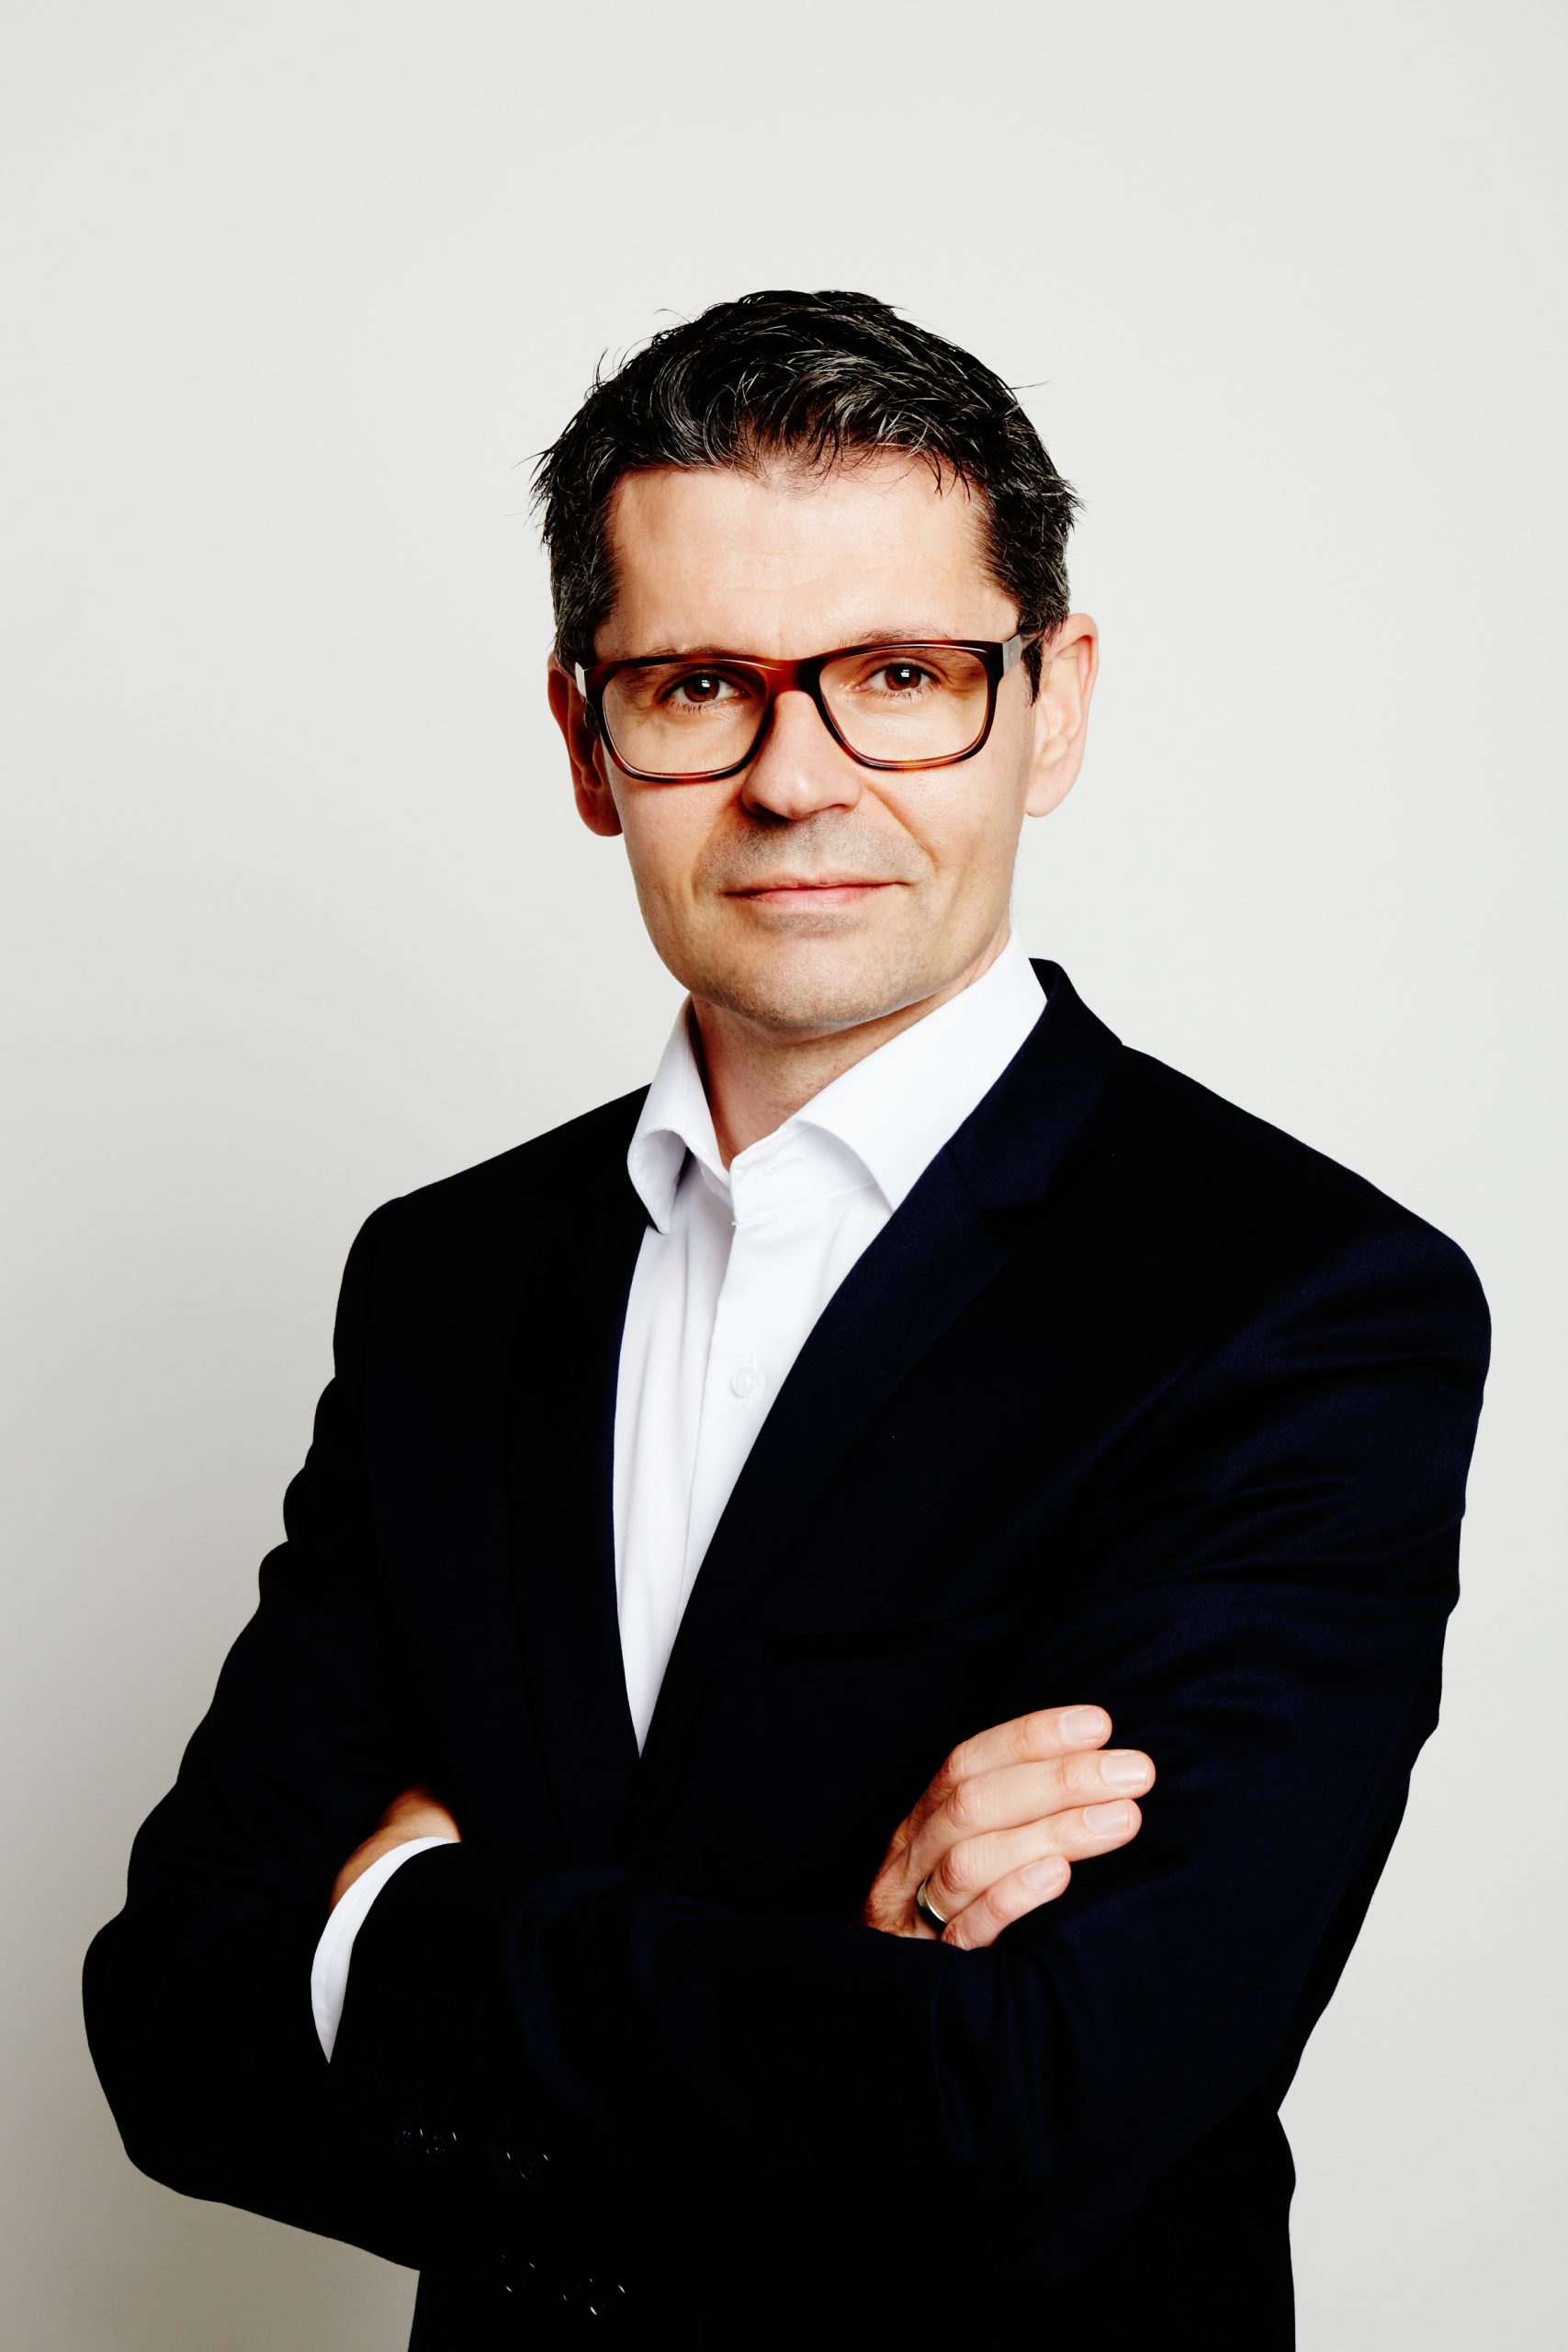 Dr. Thomas Haller